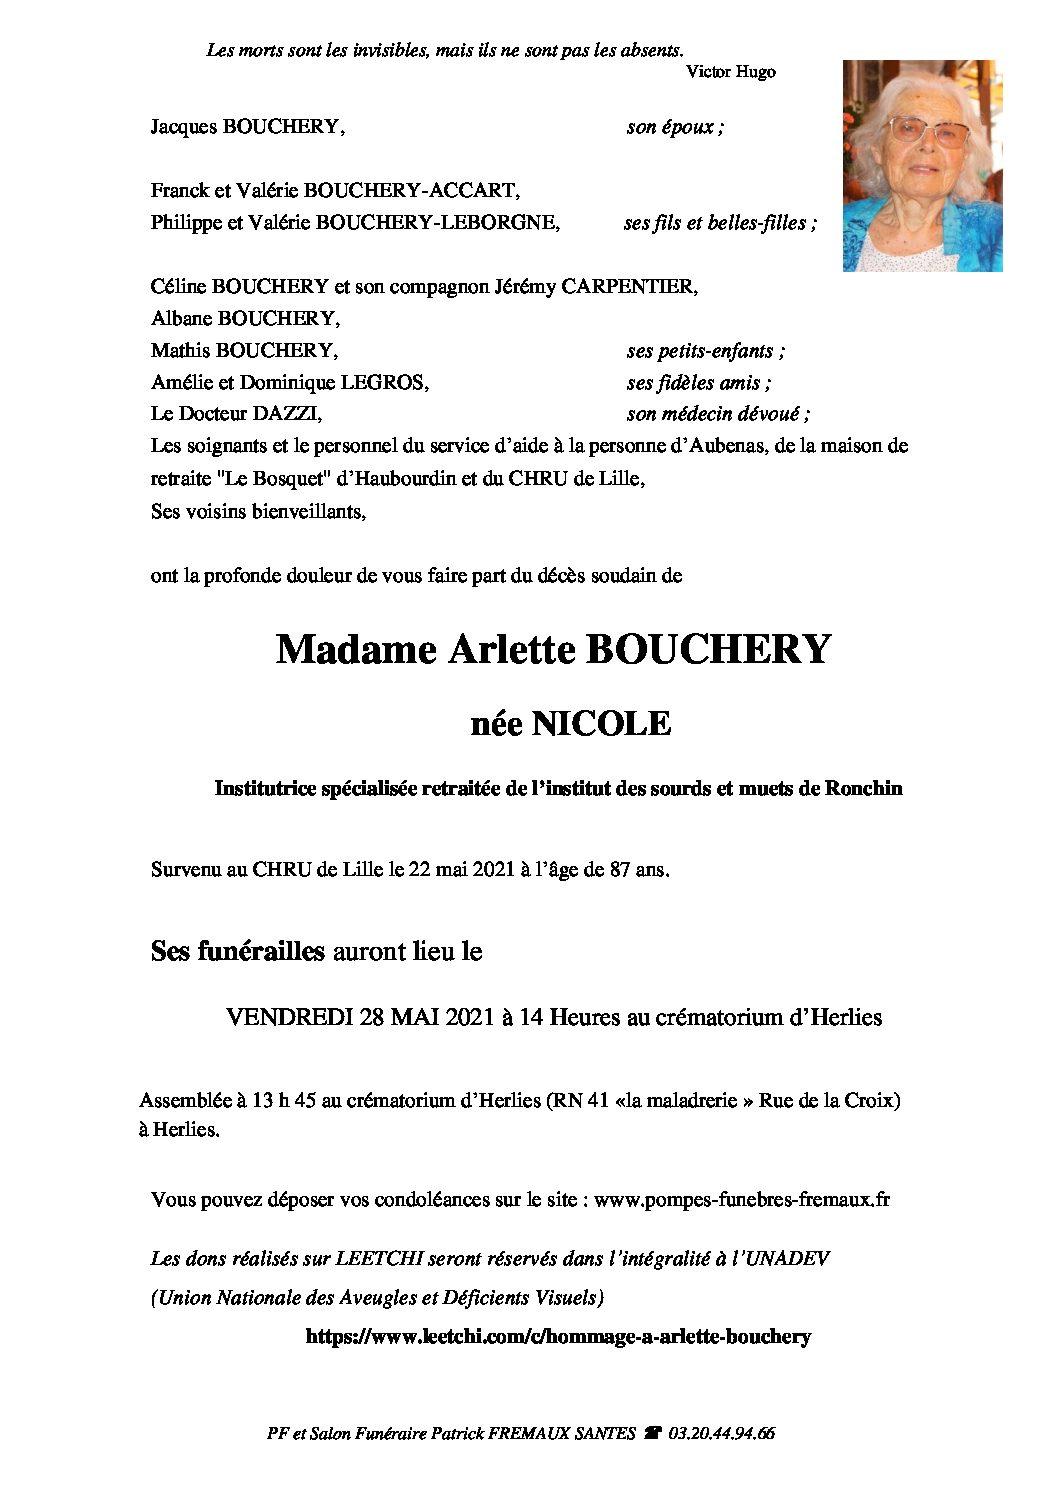 Madame Arlette BOUCHERY née NICOLE